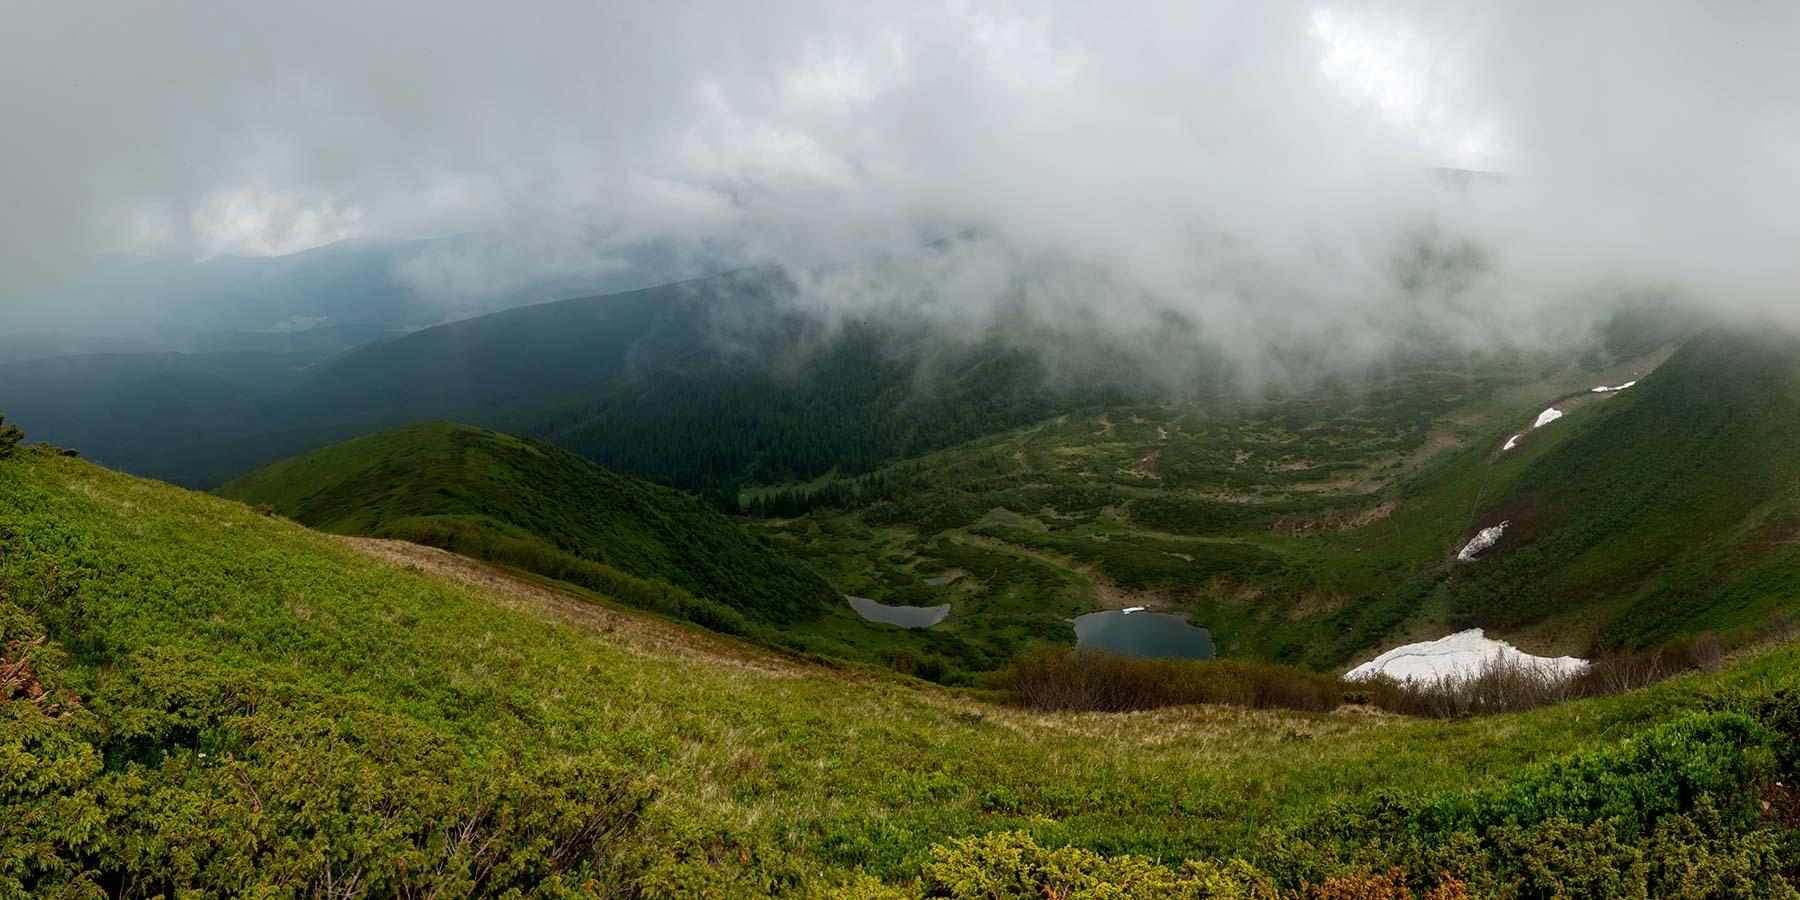 карпаты, горы, облака, небо, дымка, драгобрат, озеро, снег, Анна Иванова